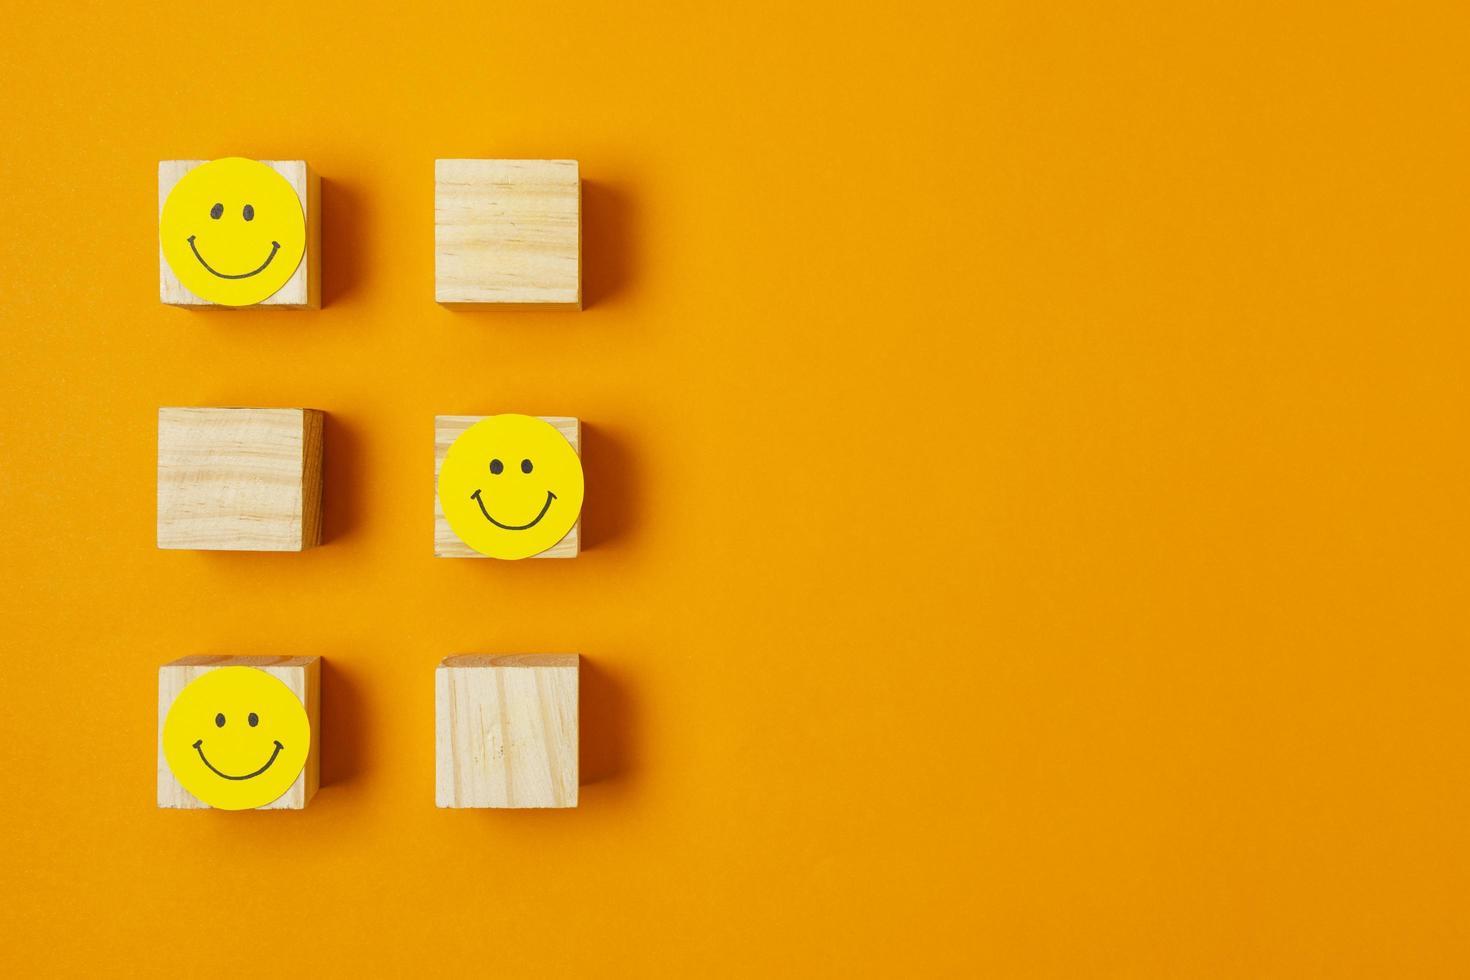 caras sonrientes en bloques de madera foto